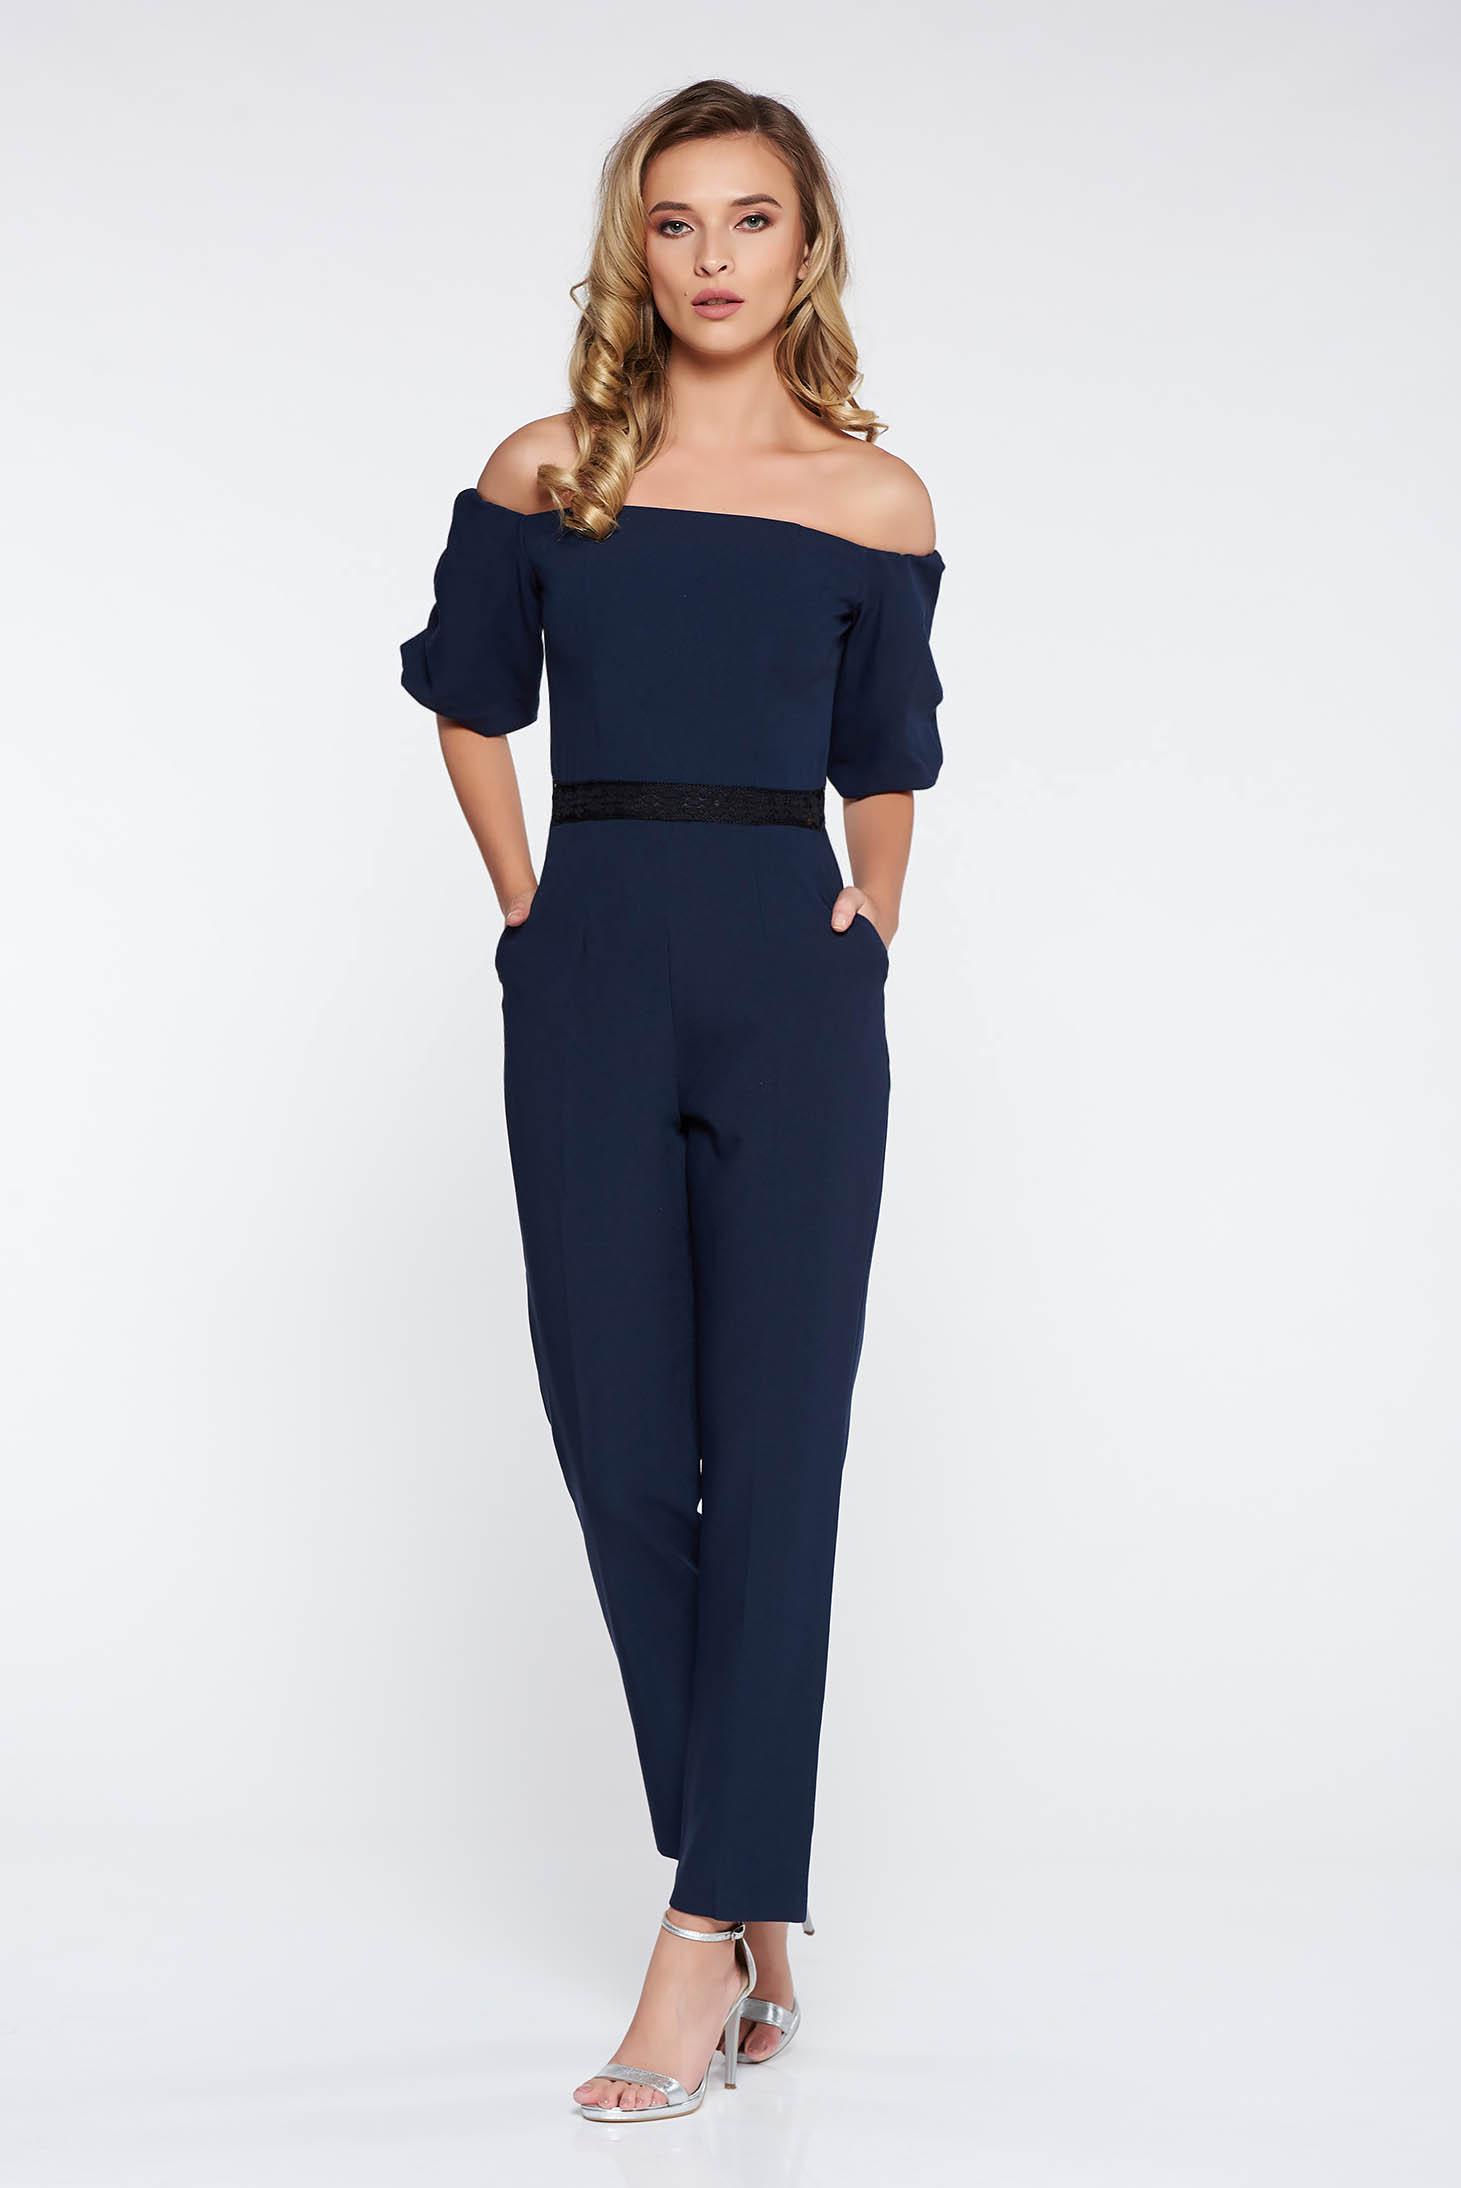 f50456dc8d4f starshiners-darkblue-elegant-jumpsuit-slightly-ela-S037604-1-366974.jpg